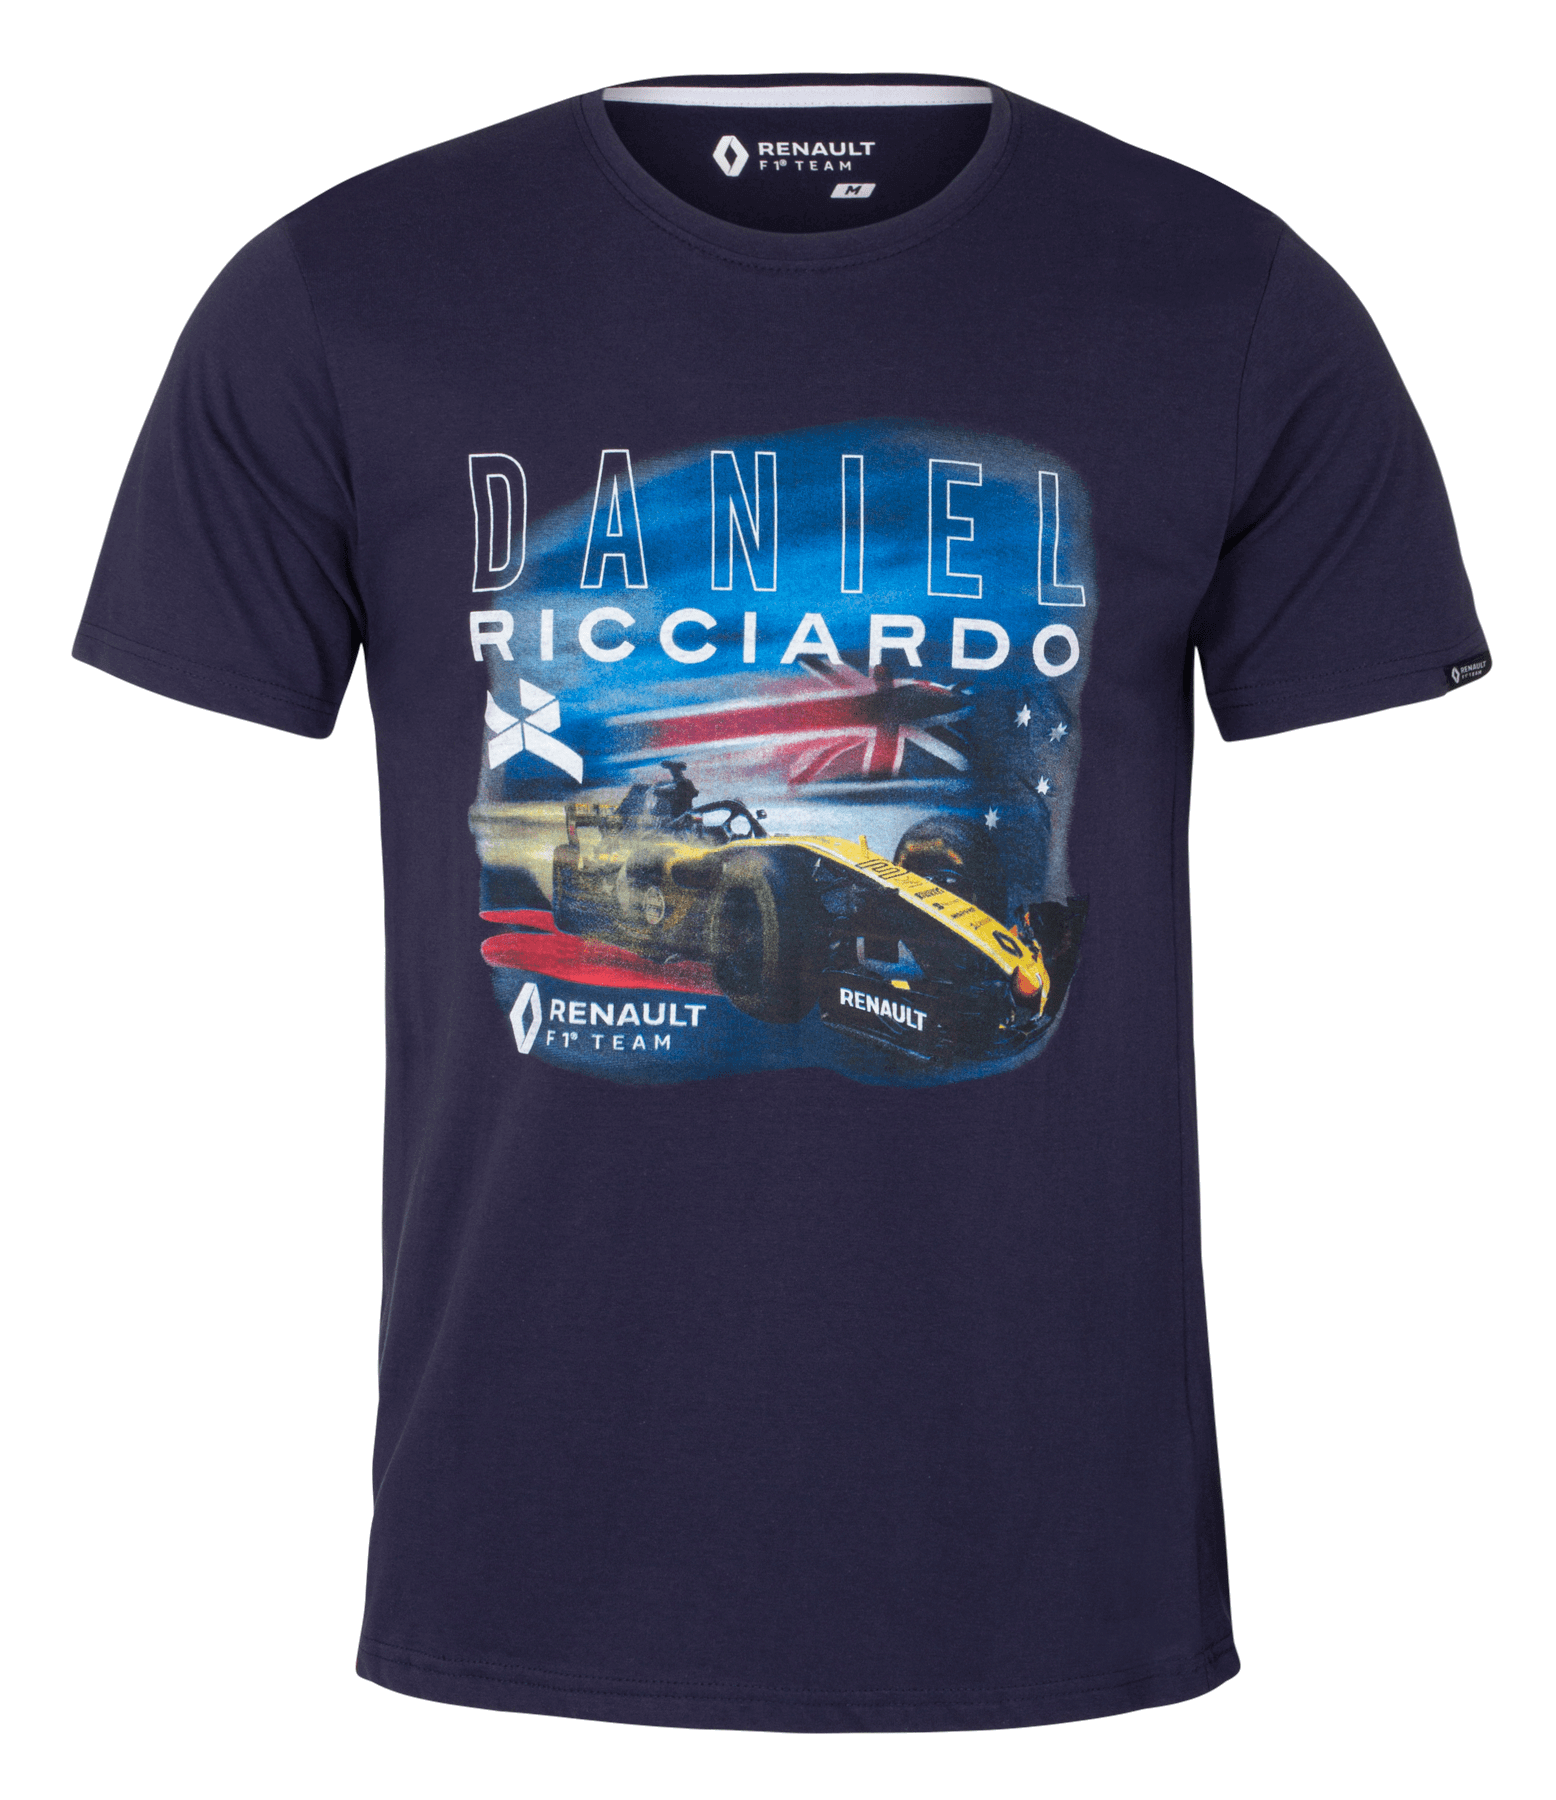 RENAULT F1® TEAM 2019 Daniel Ricciardo Men's T-shirt - Blue